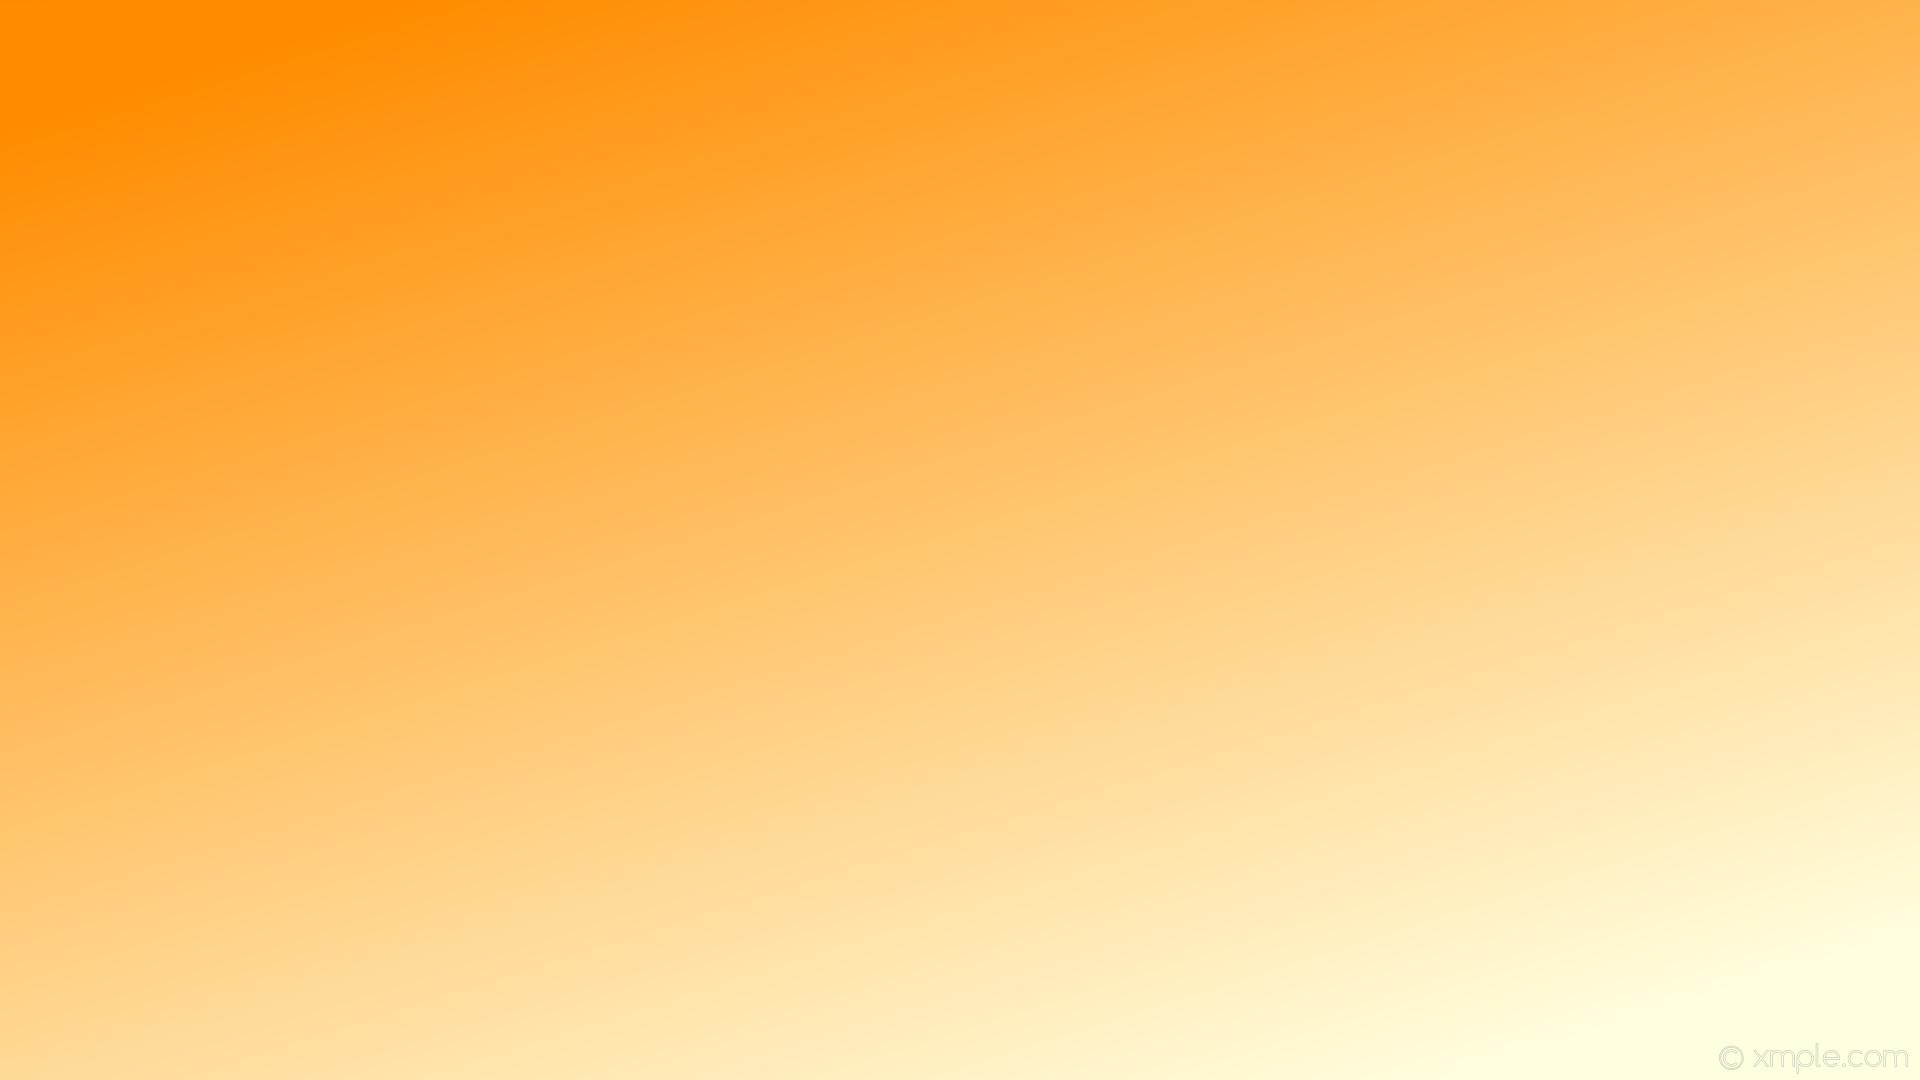 wallpaper orange gradient yellow linear light yellow dark orange #ffffe0  #ff8c00 315°